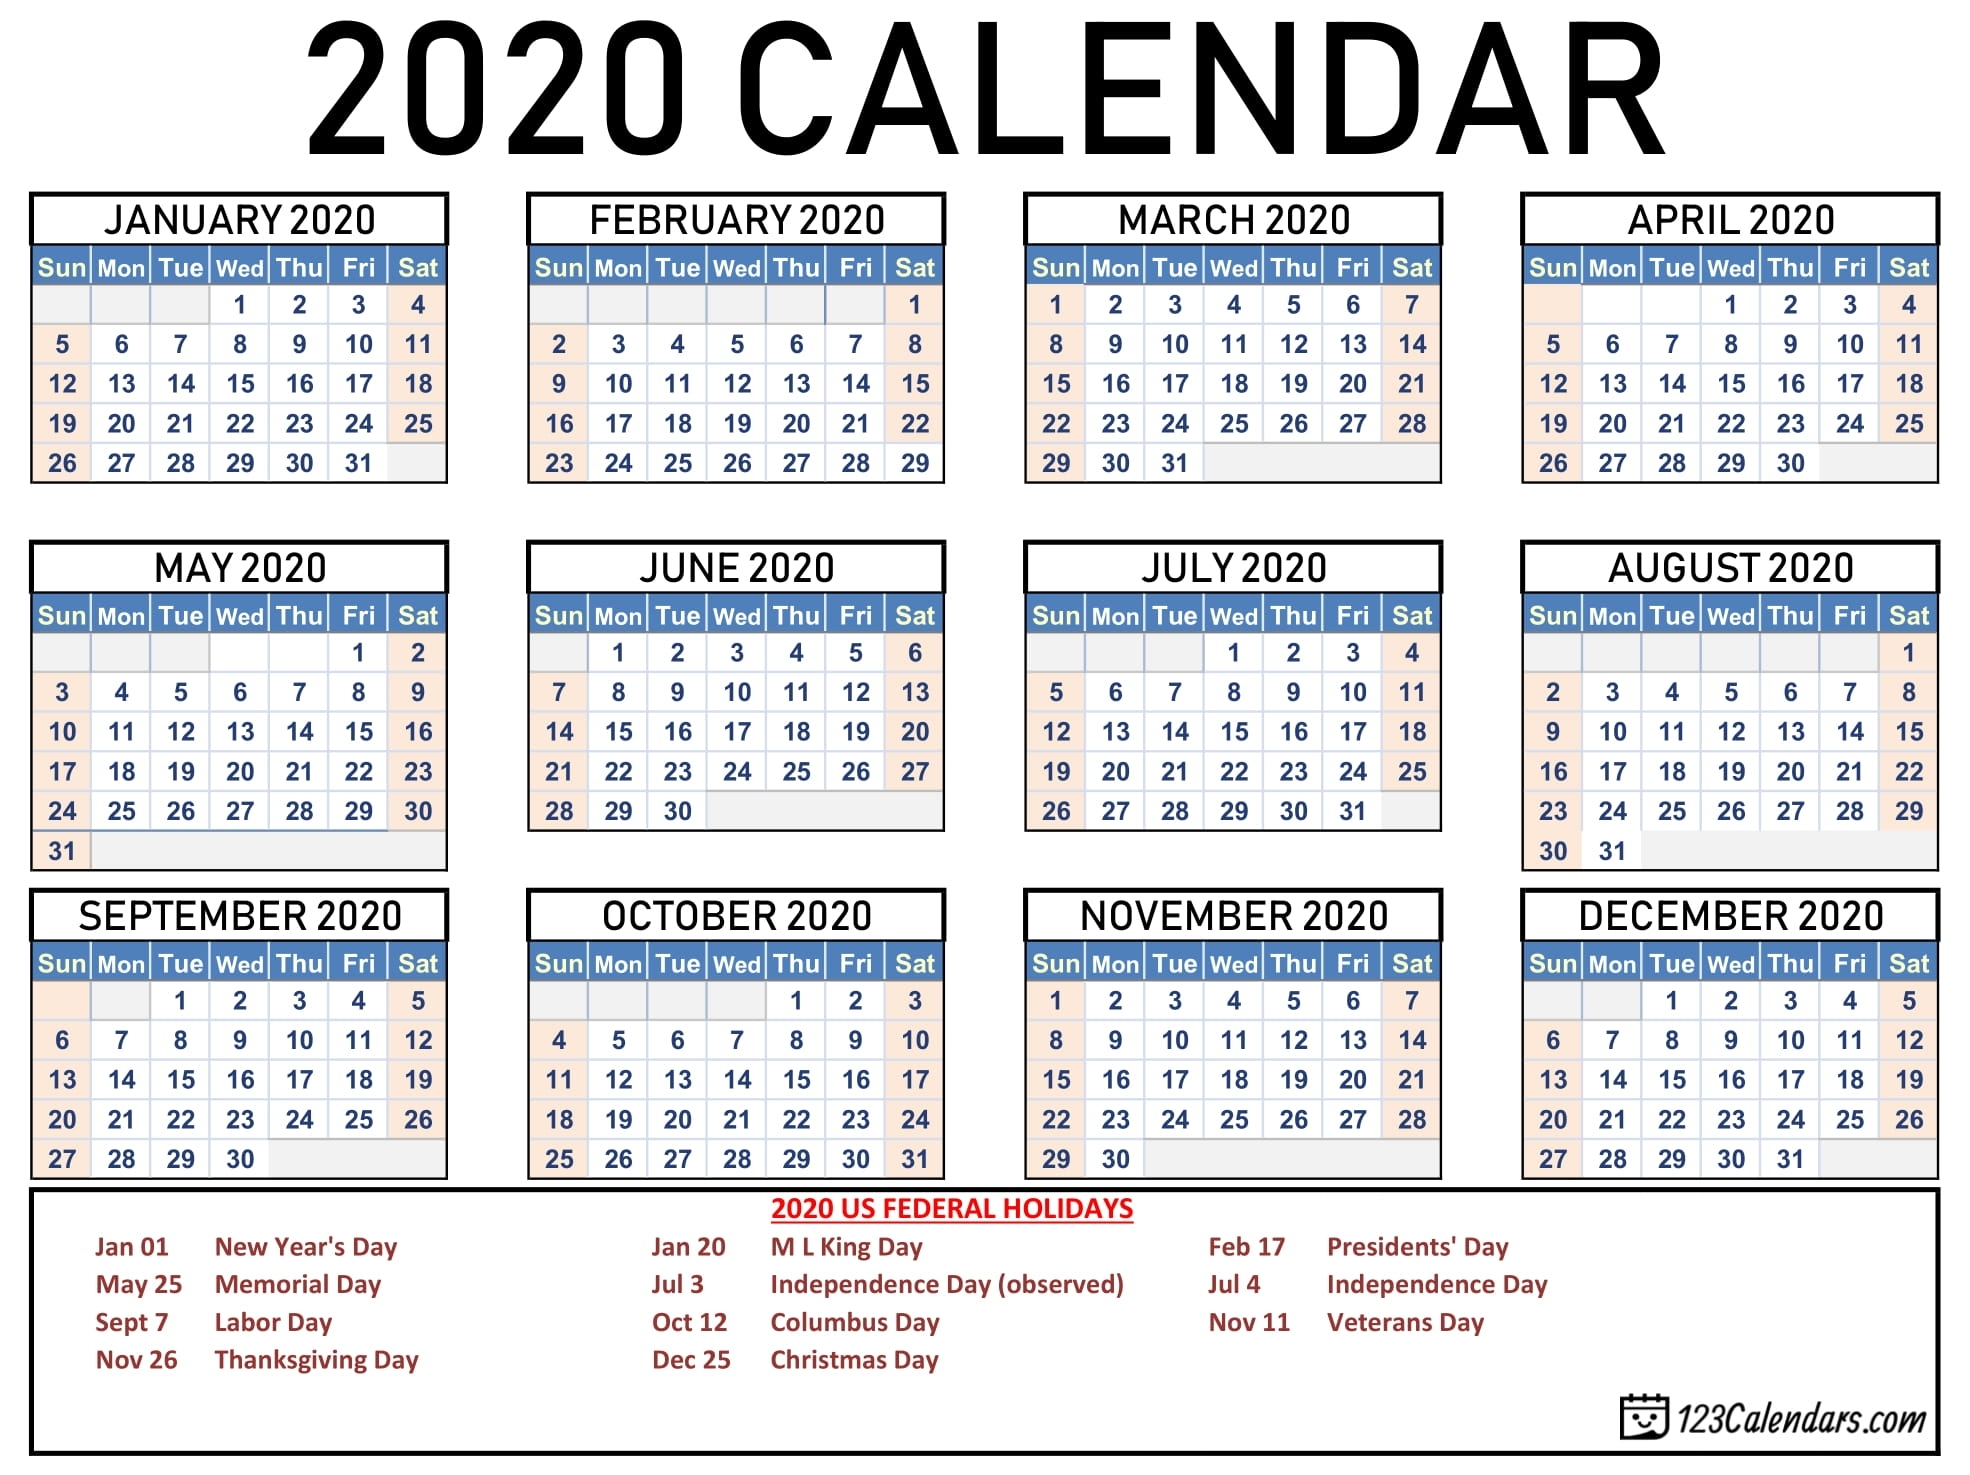 Free Printable 2020 Calendar | 123Calendars in How To Print A Pocket Calander